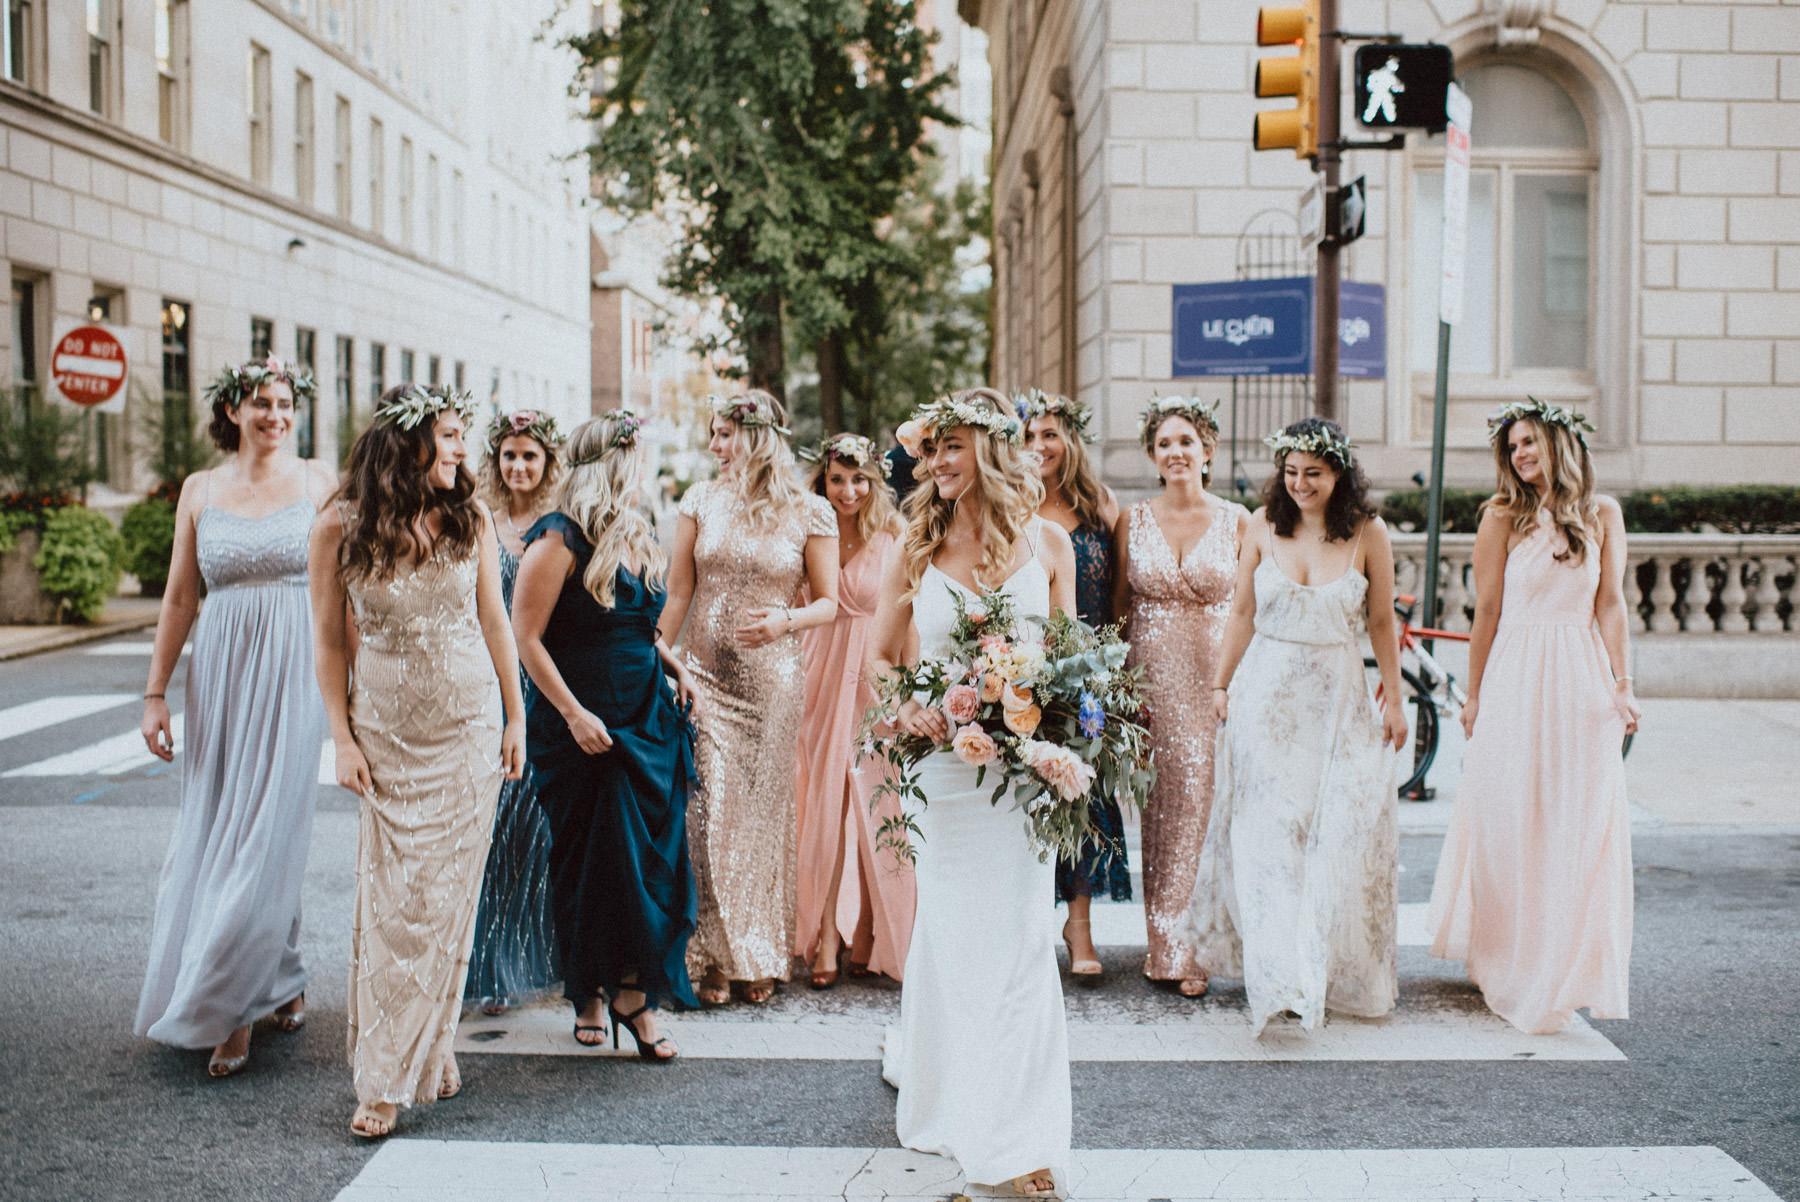 230-la-cherie-philly-wedding-12.jpg